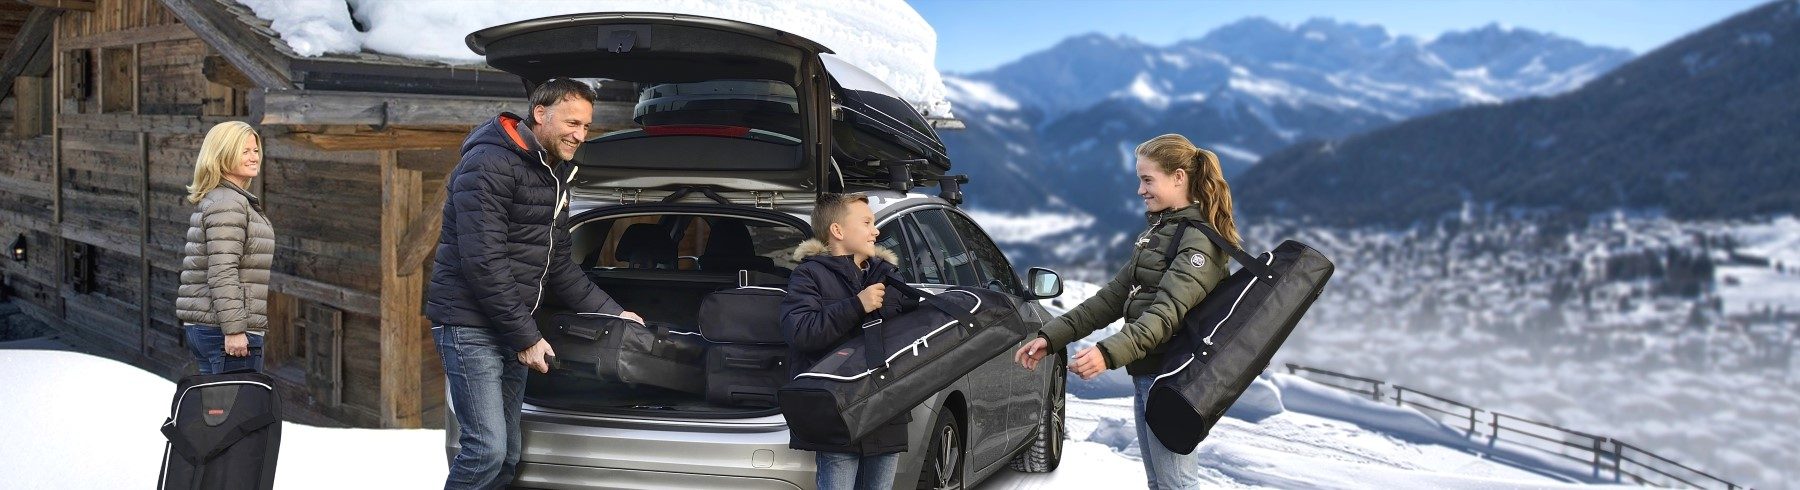 car-bags-unbeschwert-auf-reisen-winter